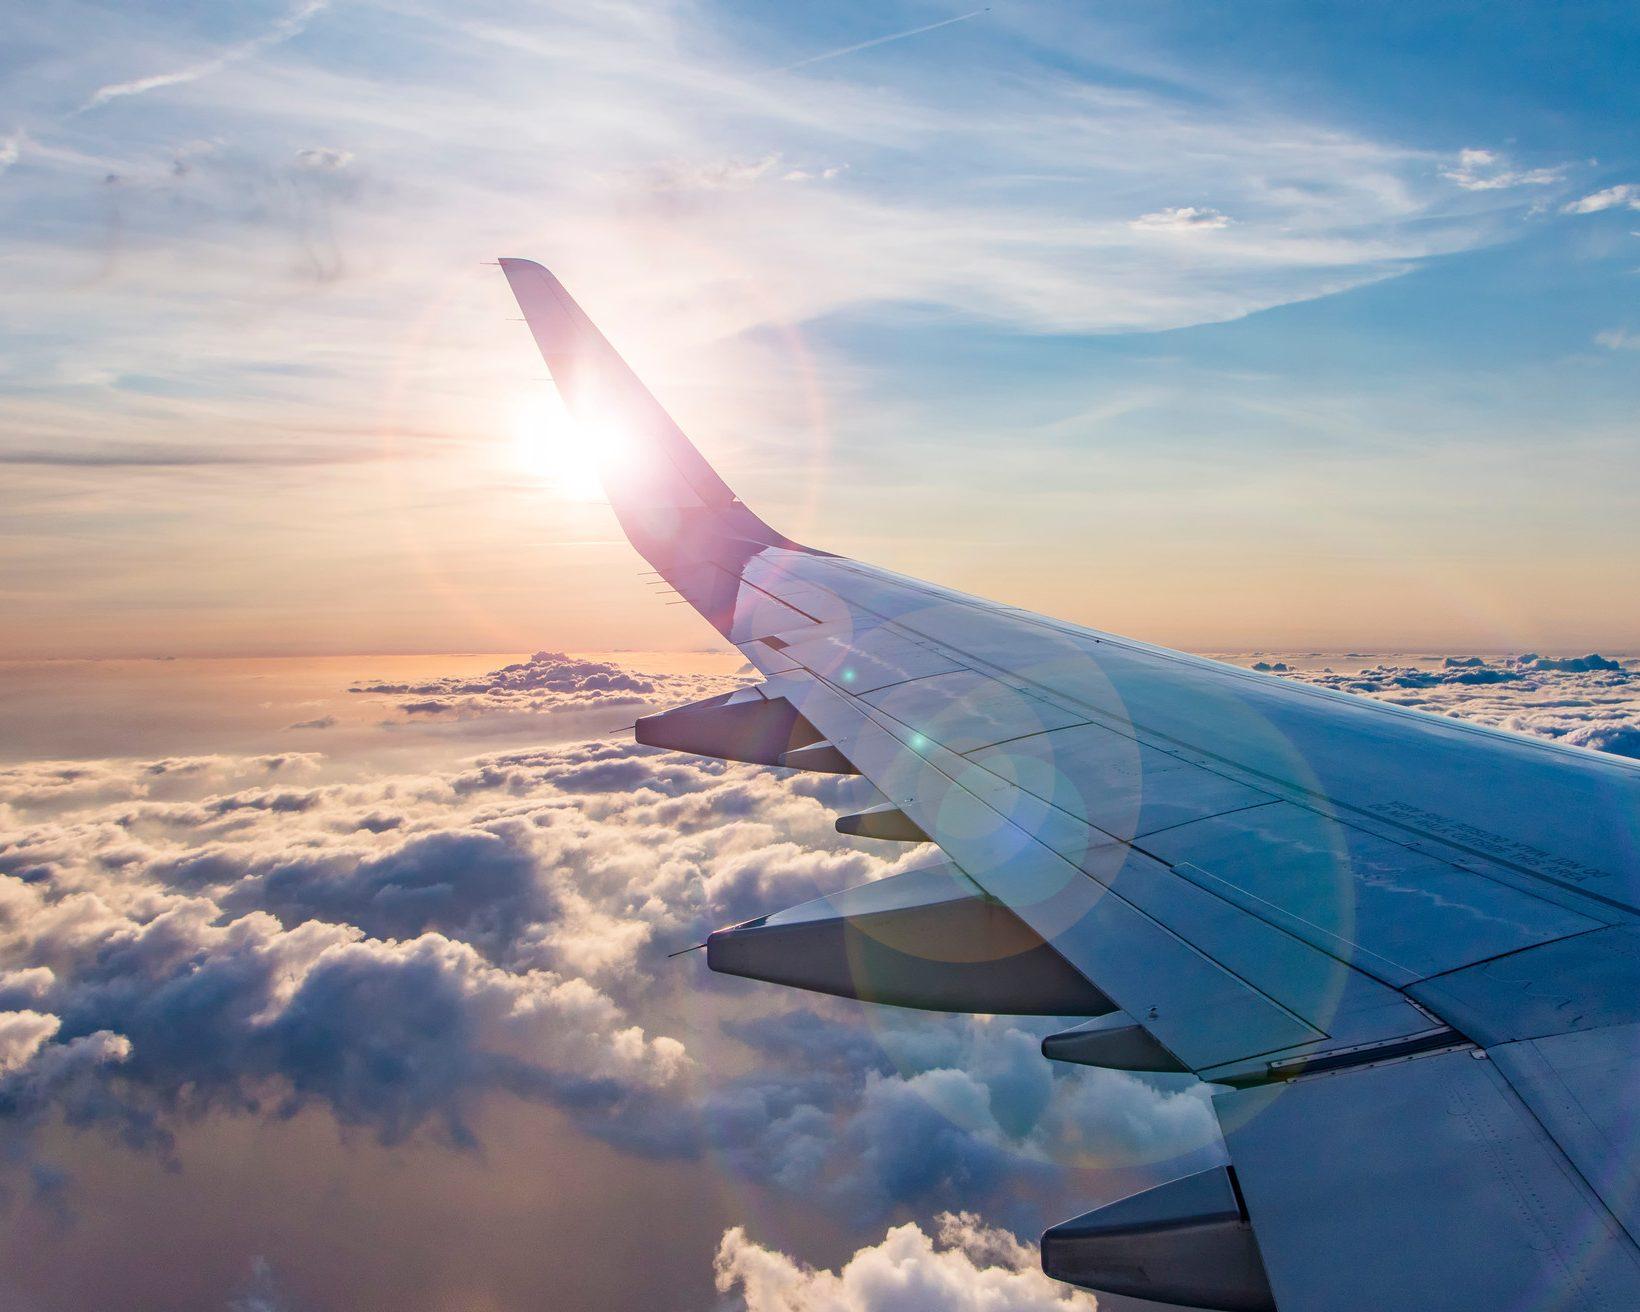 Flight search trends in a COVID-19 world